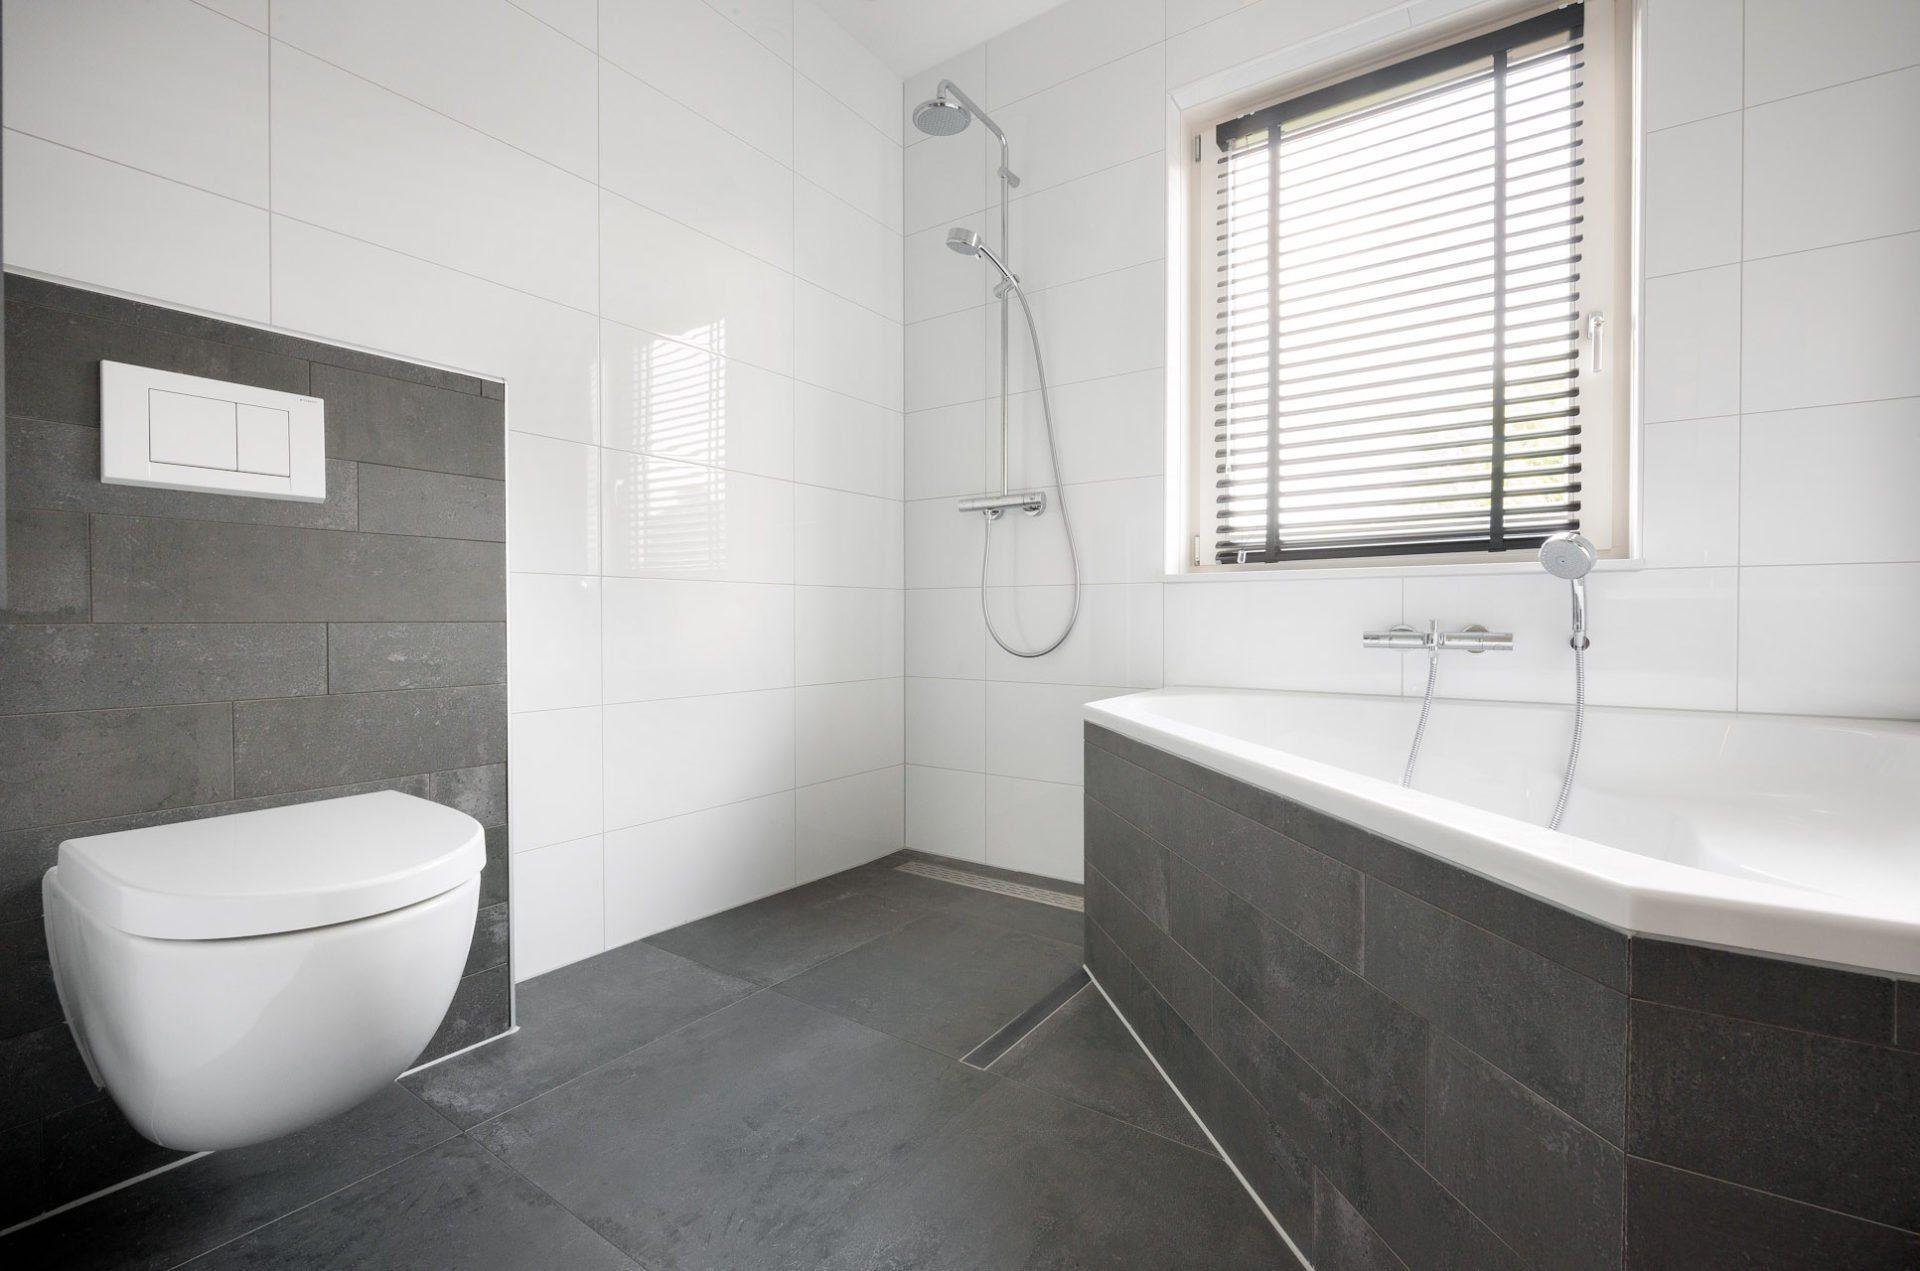 Antraciet vloertegels in woonkamer en badkamer - Lichtgrijze gang ...